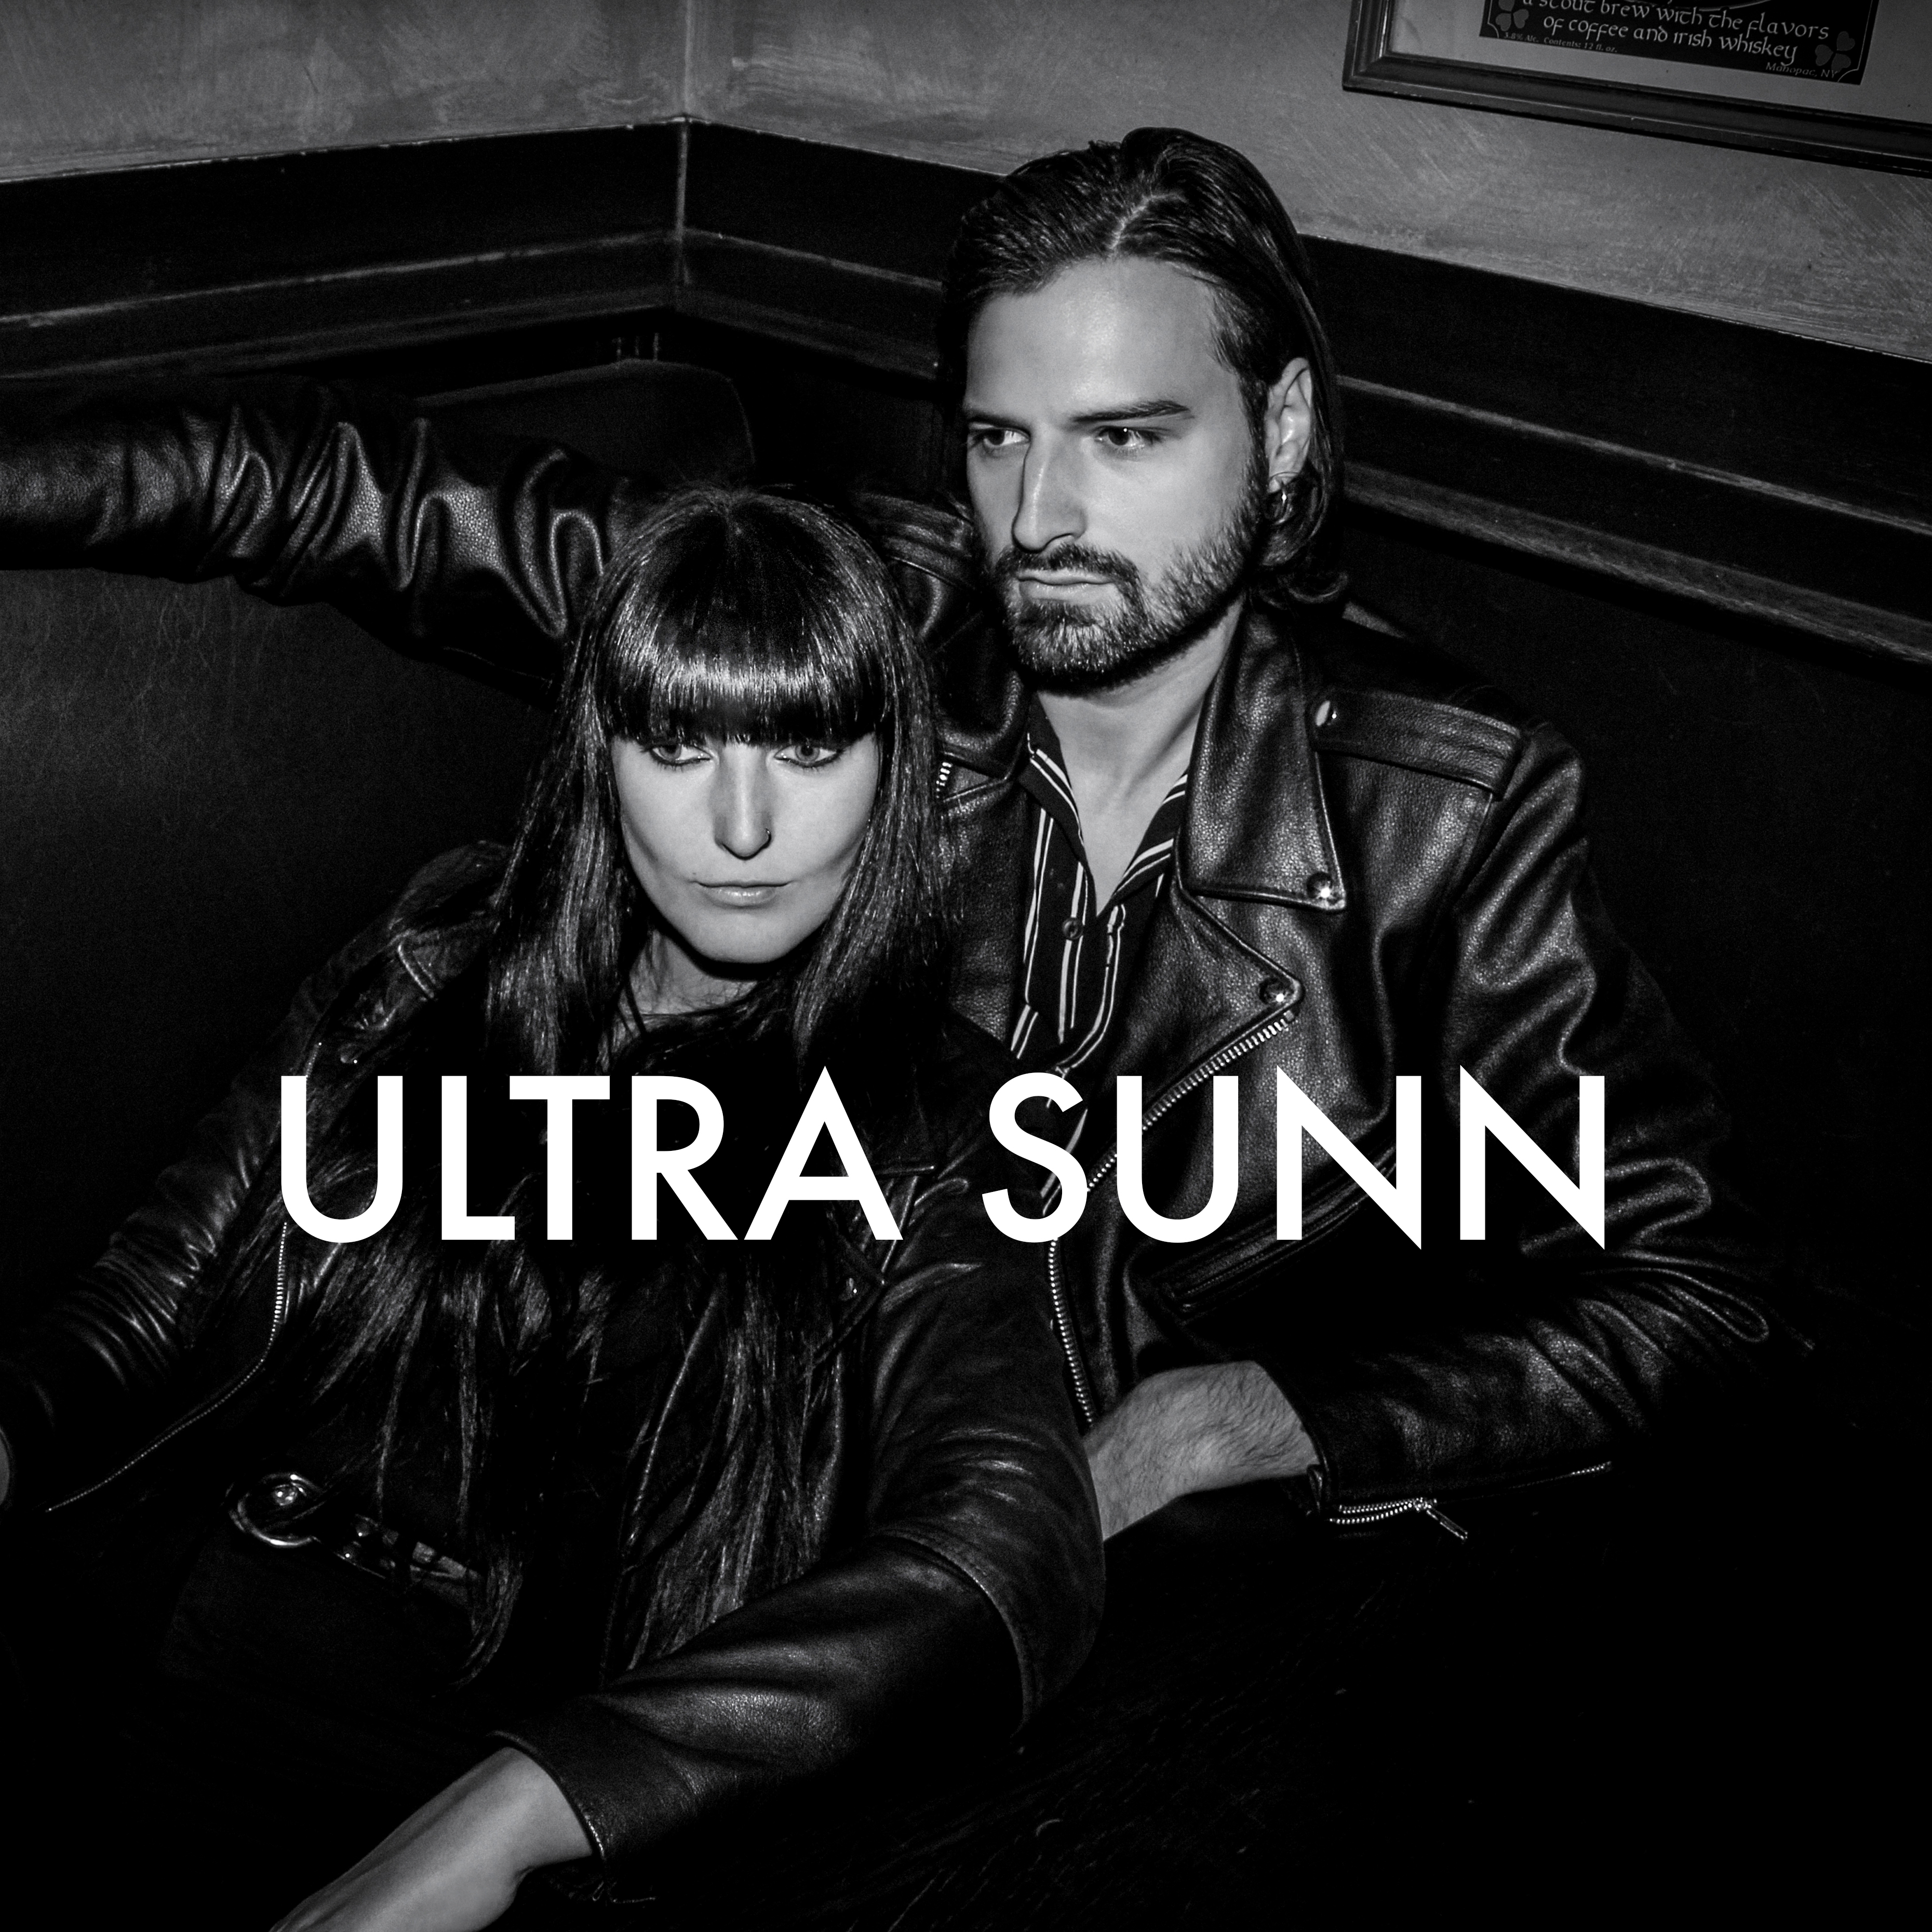 Kris Parenti - Ultra Sunn